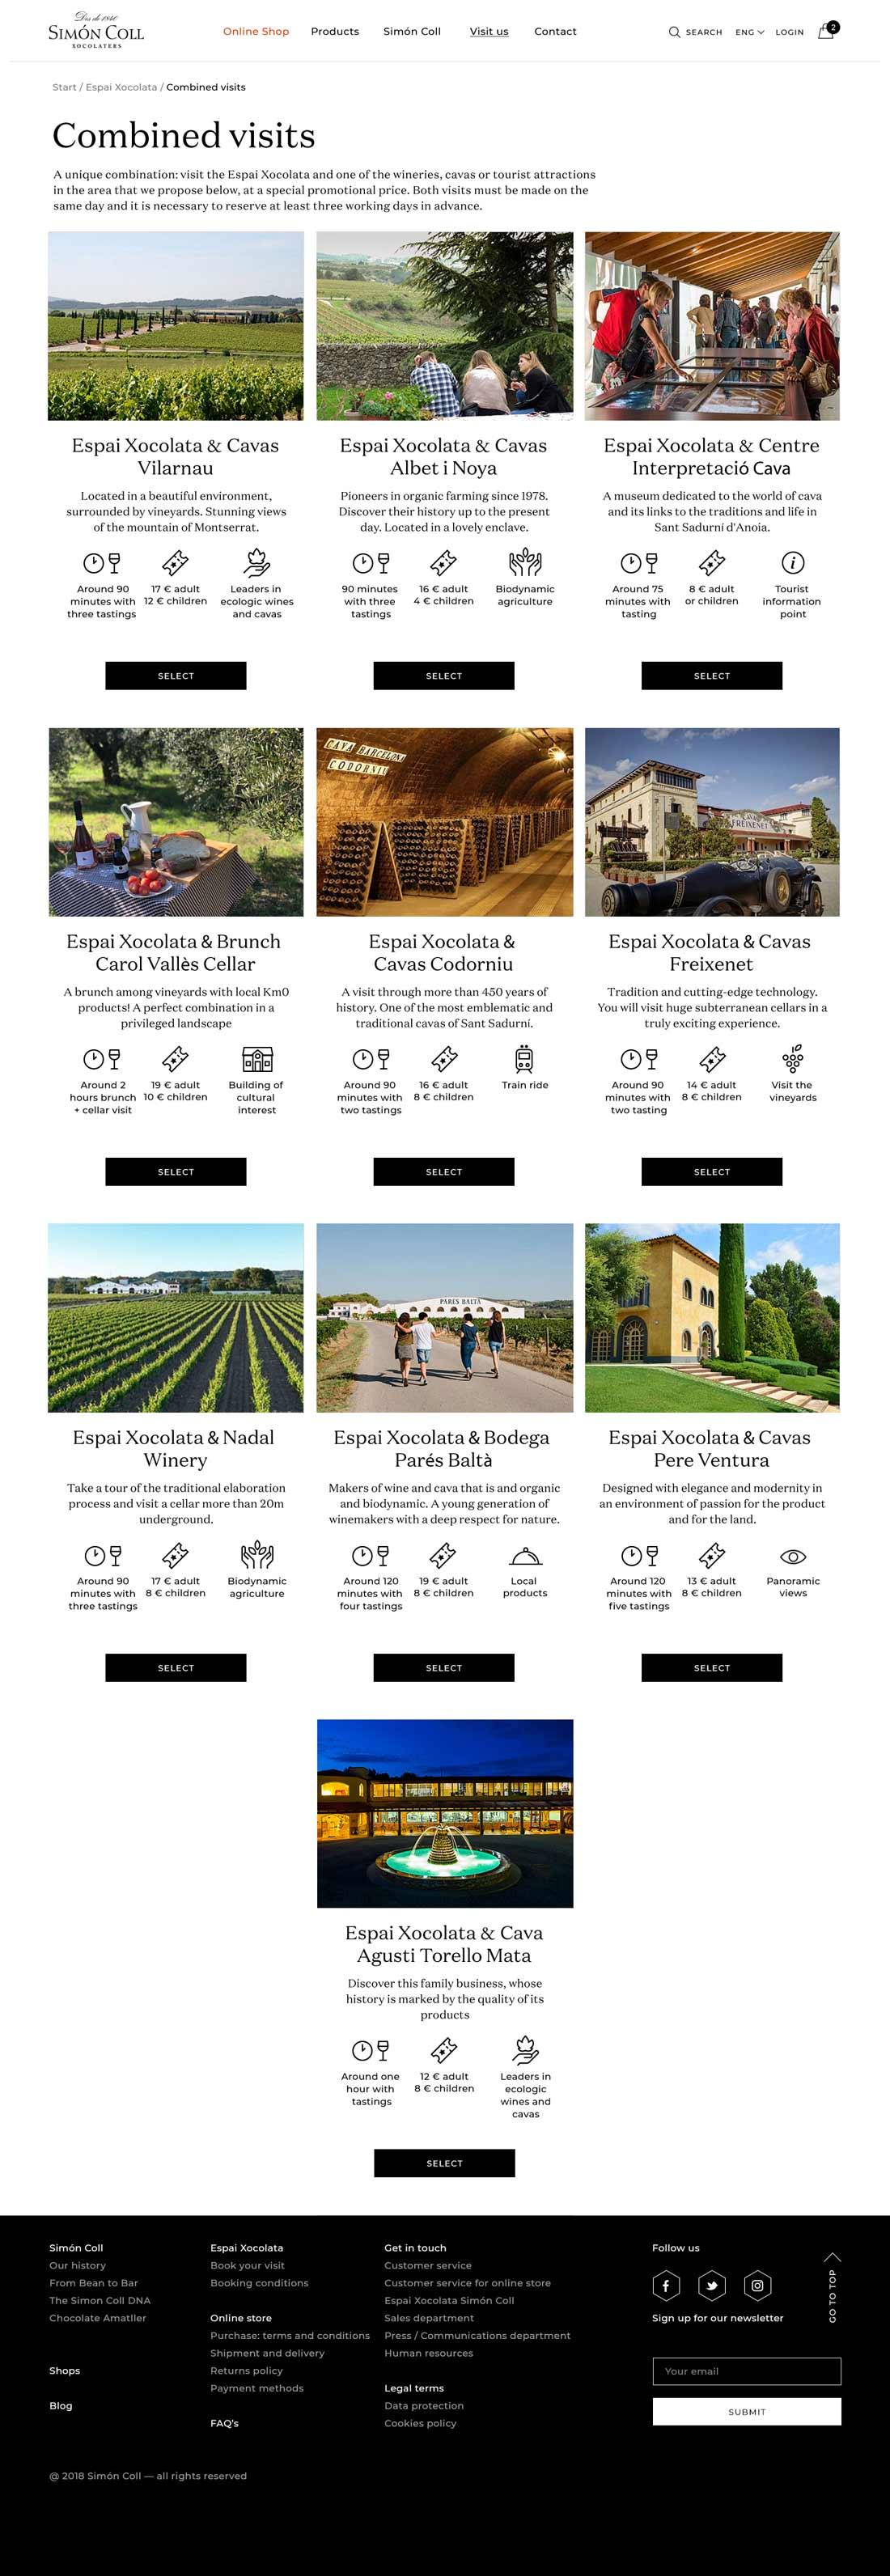 Simon Coll website bookings